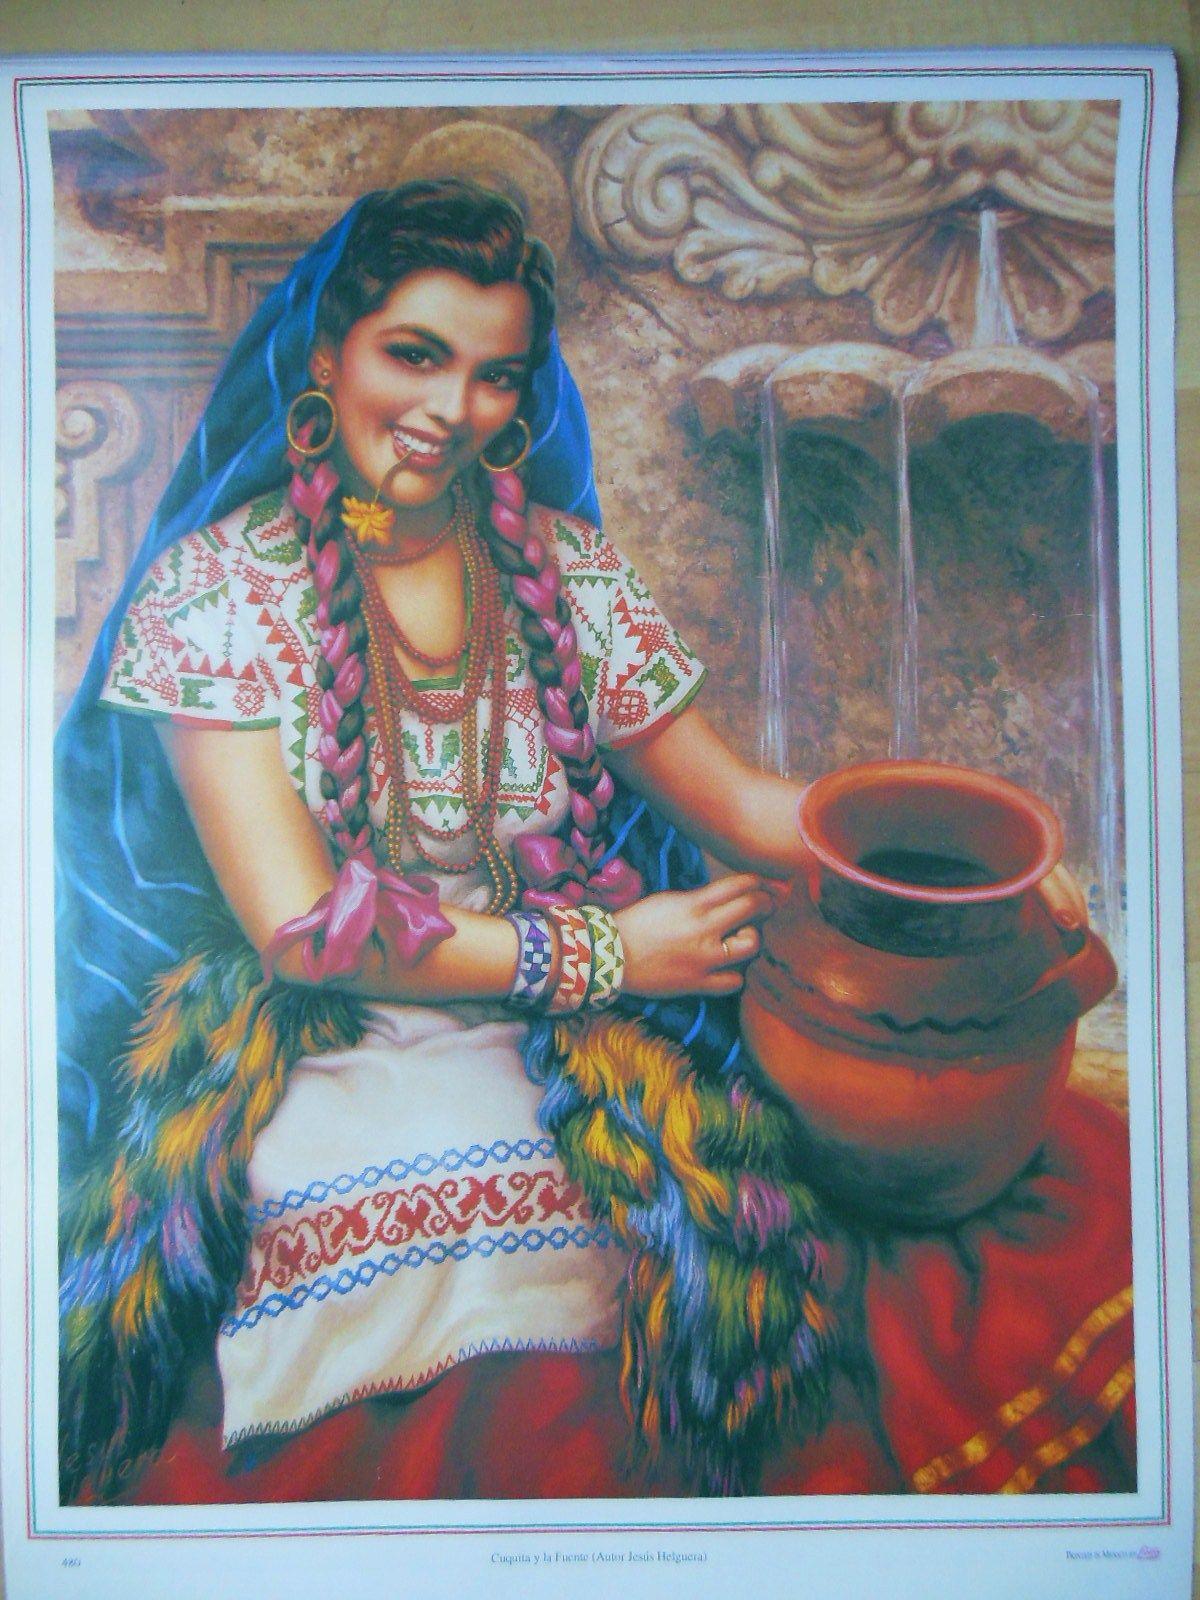 Vintage Mexican Calendar Art : Traditional mexican calendar art jesus helguera beautiful